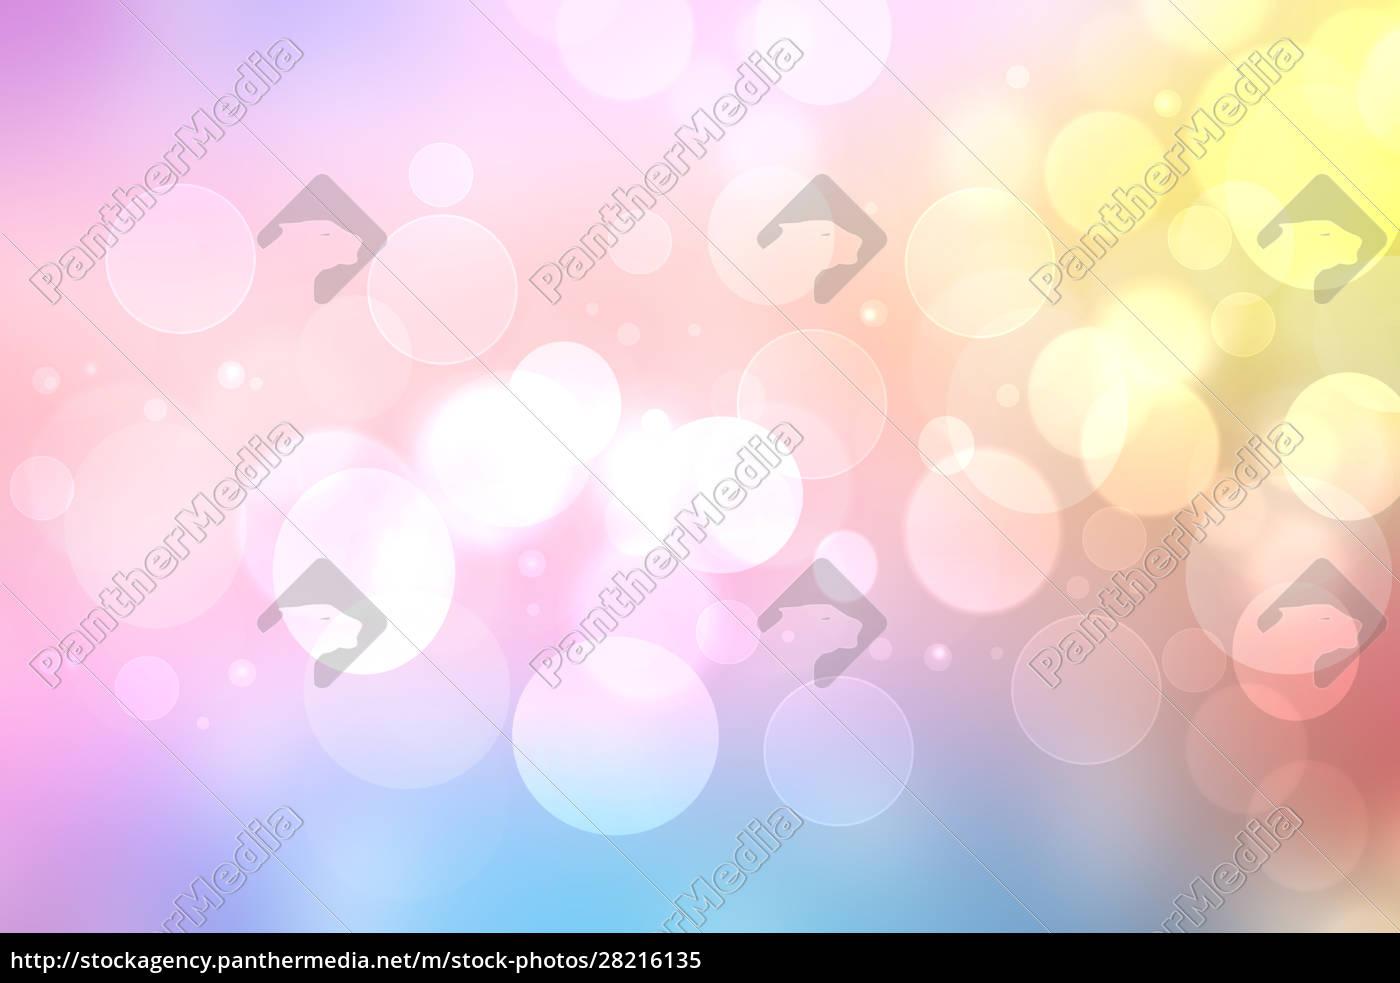 abstract, blurred, fresh, vivid, spring, summer - 28216135